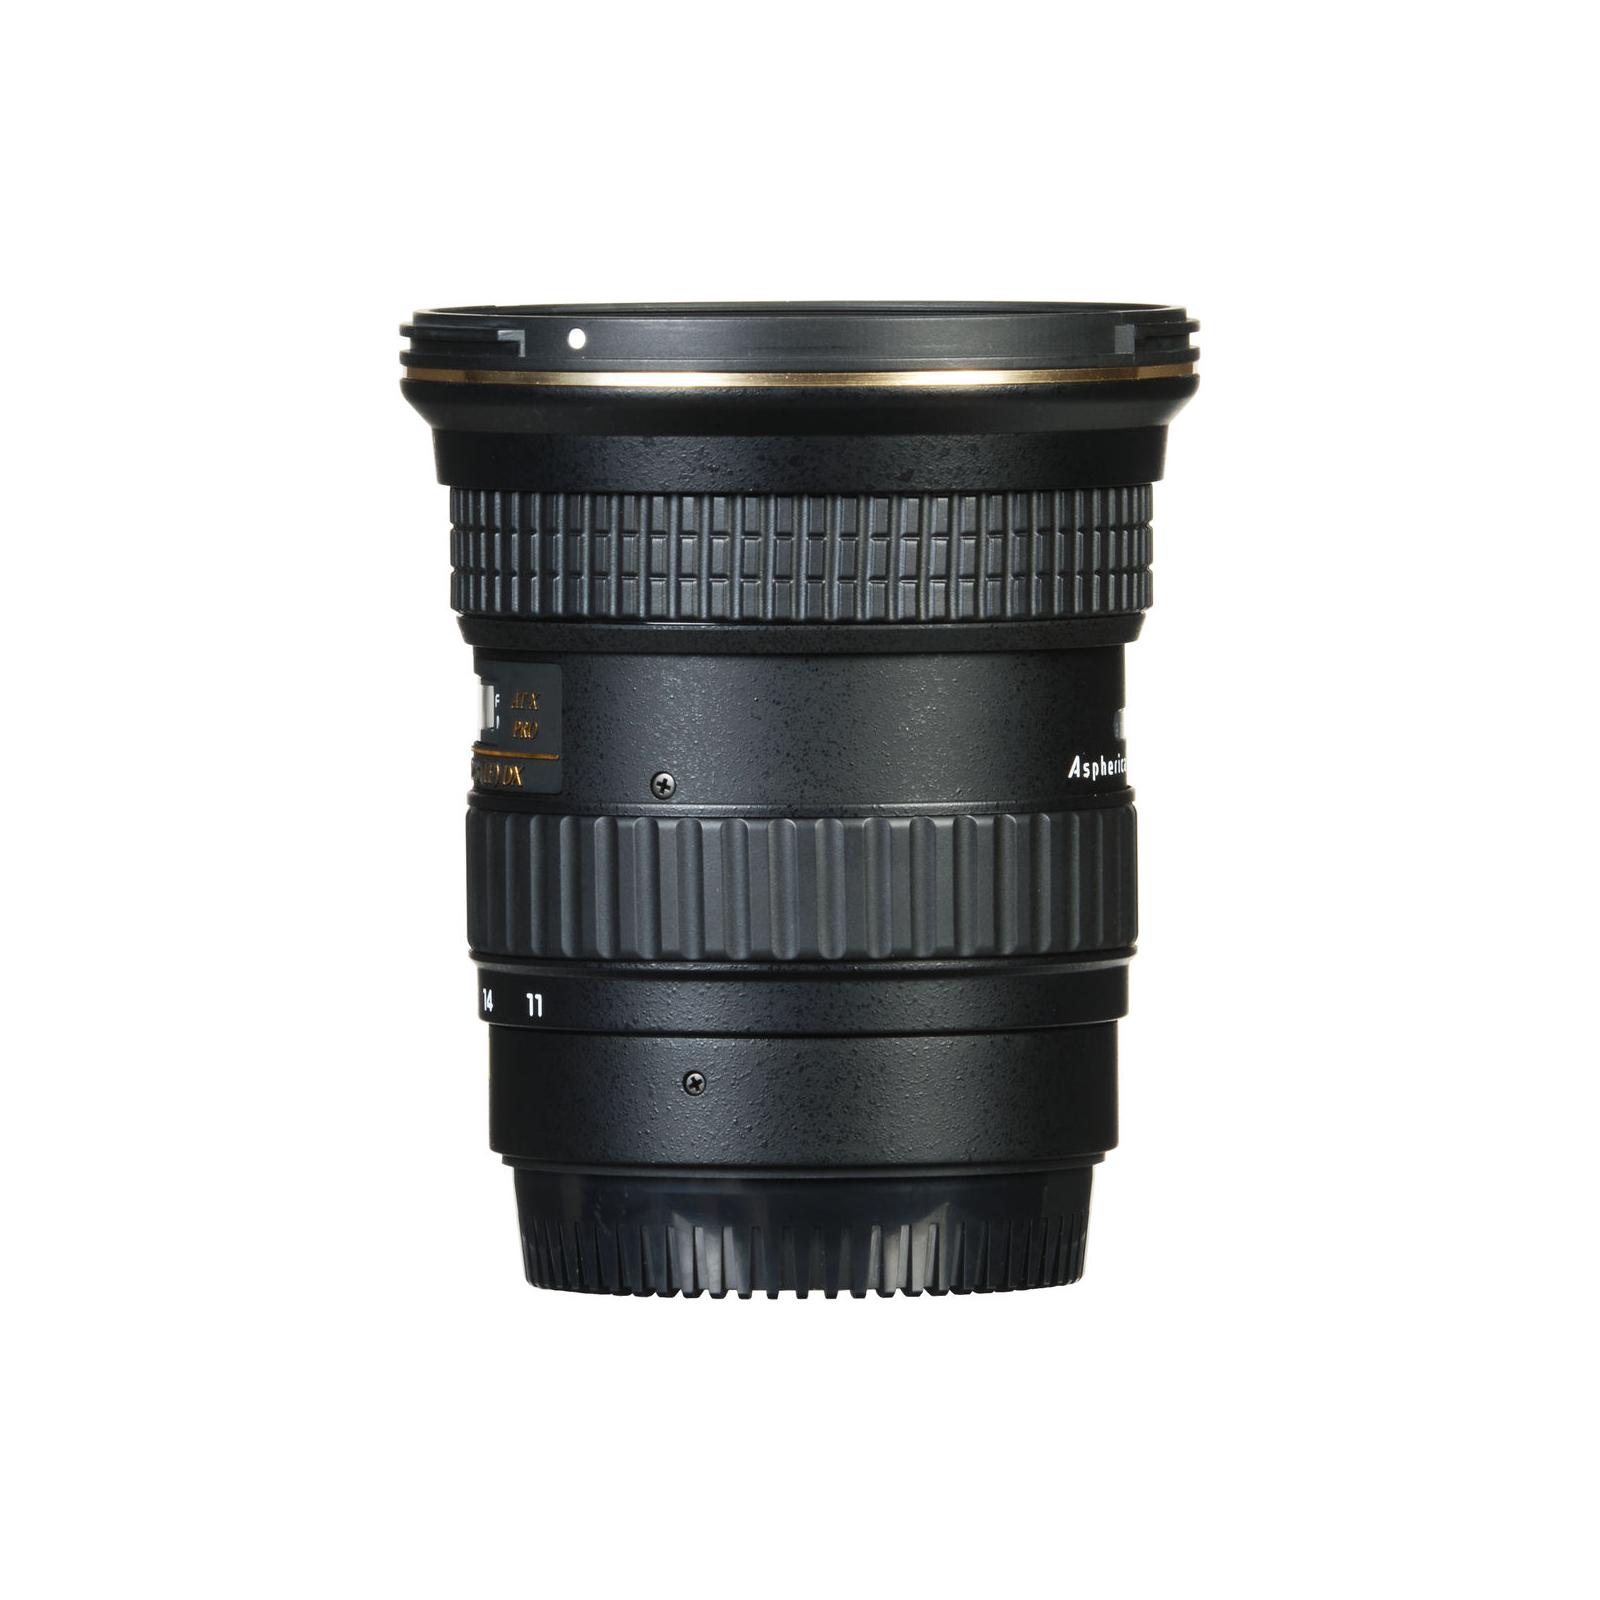 Объектив Tokina AT-X PRO DX 11-20mm f/2.8 (Canon) (ATXAF120DXC) изображение 3